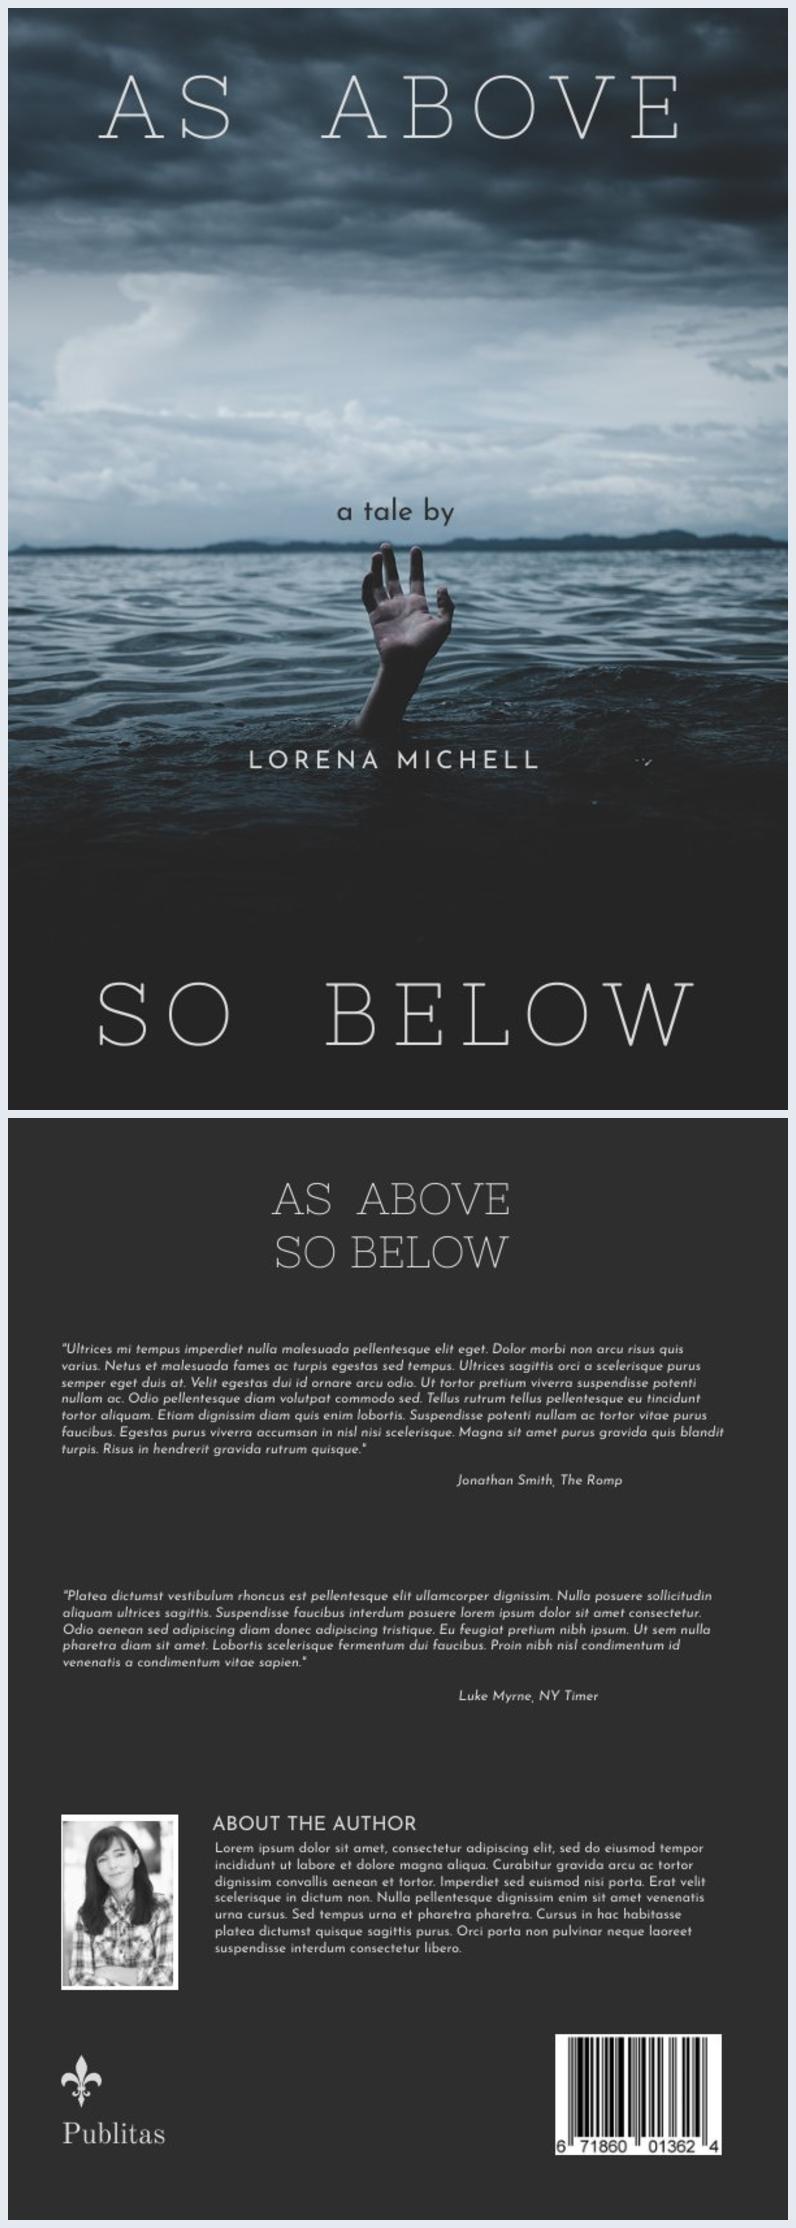 A4 Book Cover Template & Design